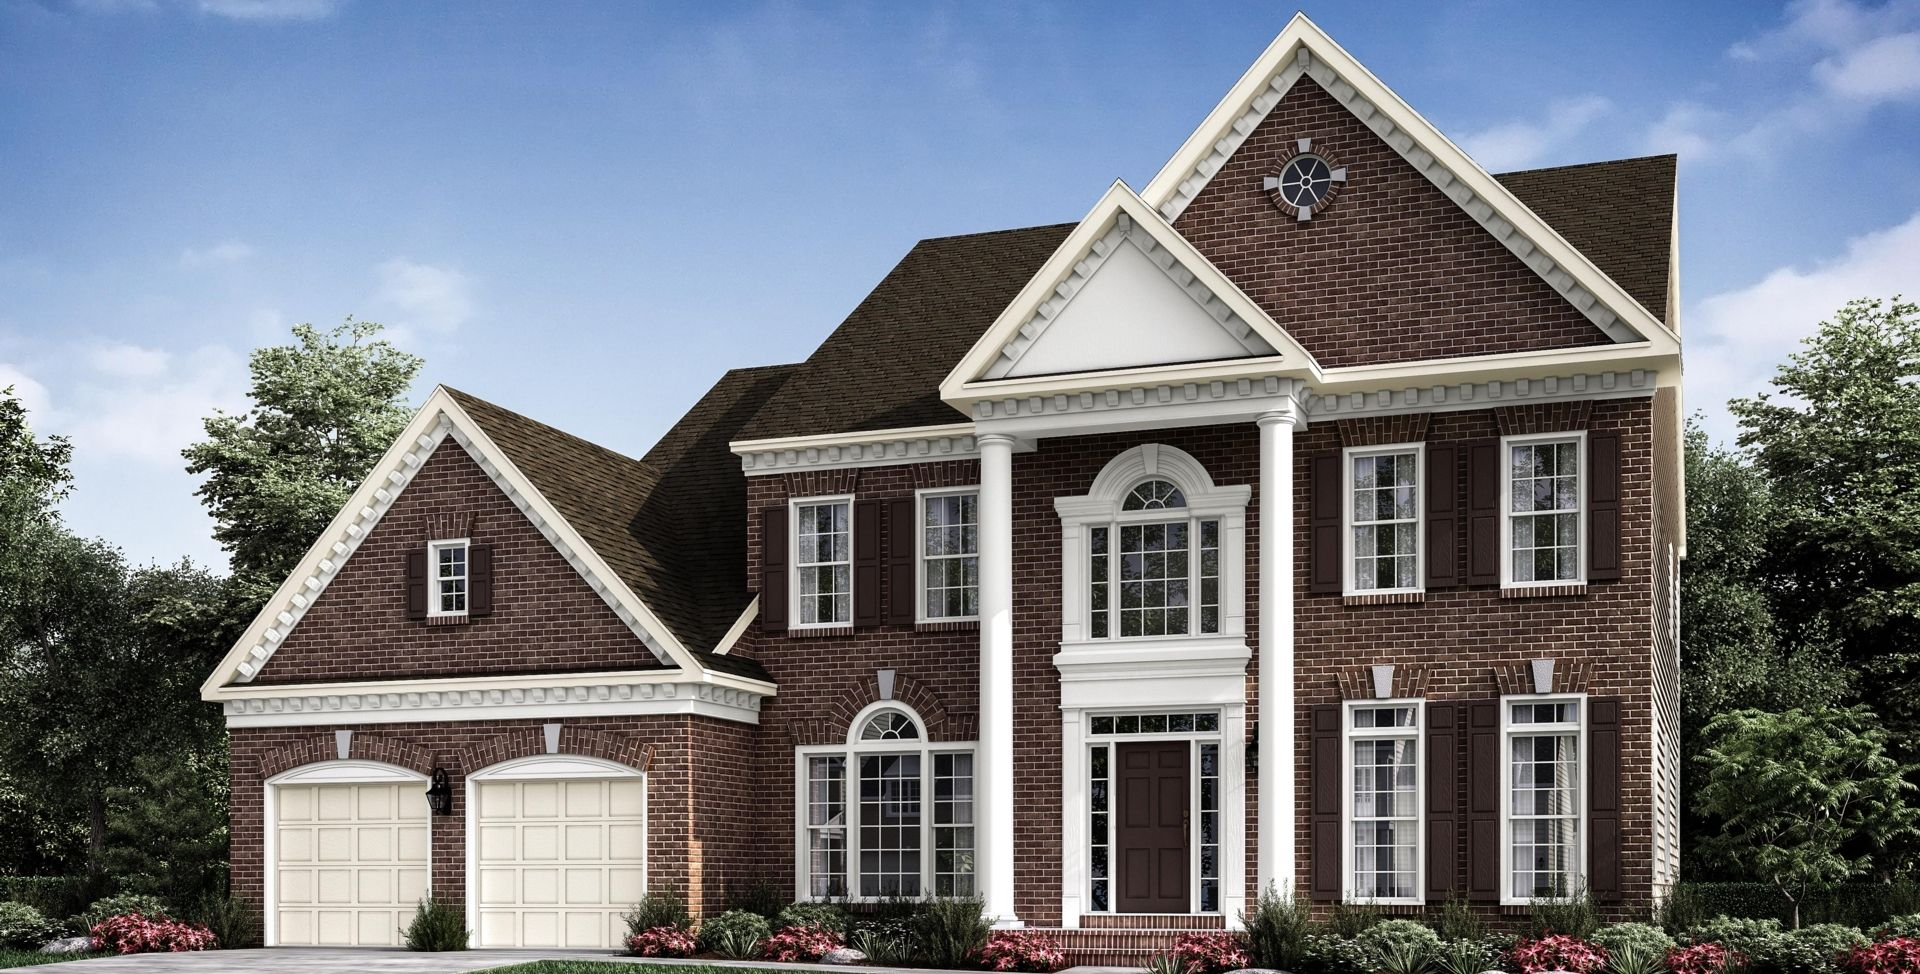 Mid atlantic builders falconaire sierra 2 0 1303214 for Mid atlantic home builders